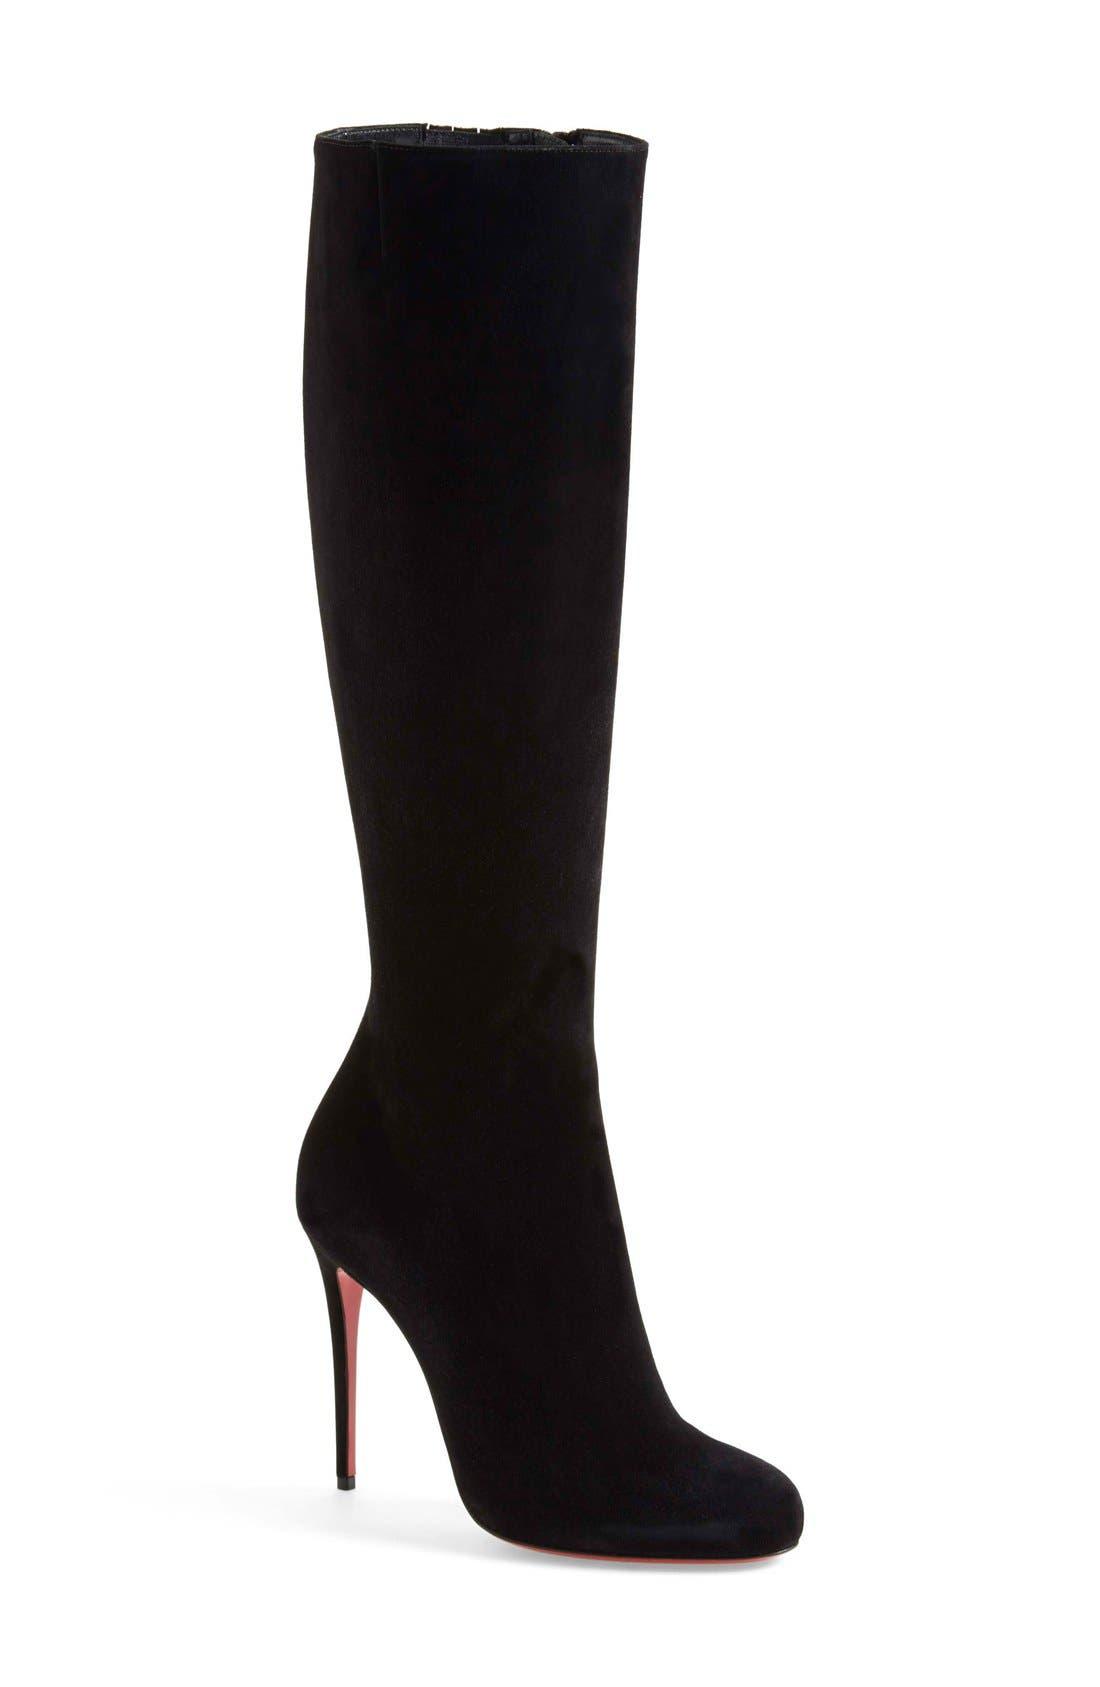 Alternate Image 1 Selected - Christian Louboutin 'Fifi' Tall Boot